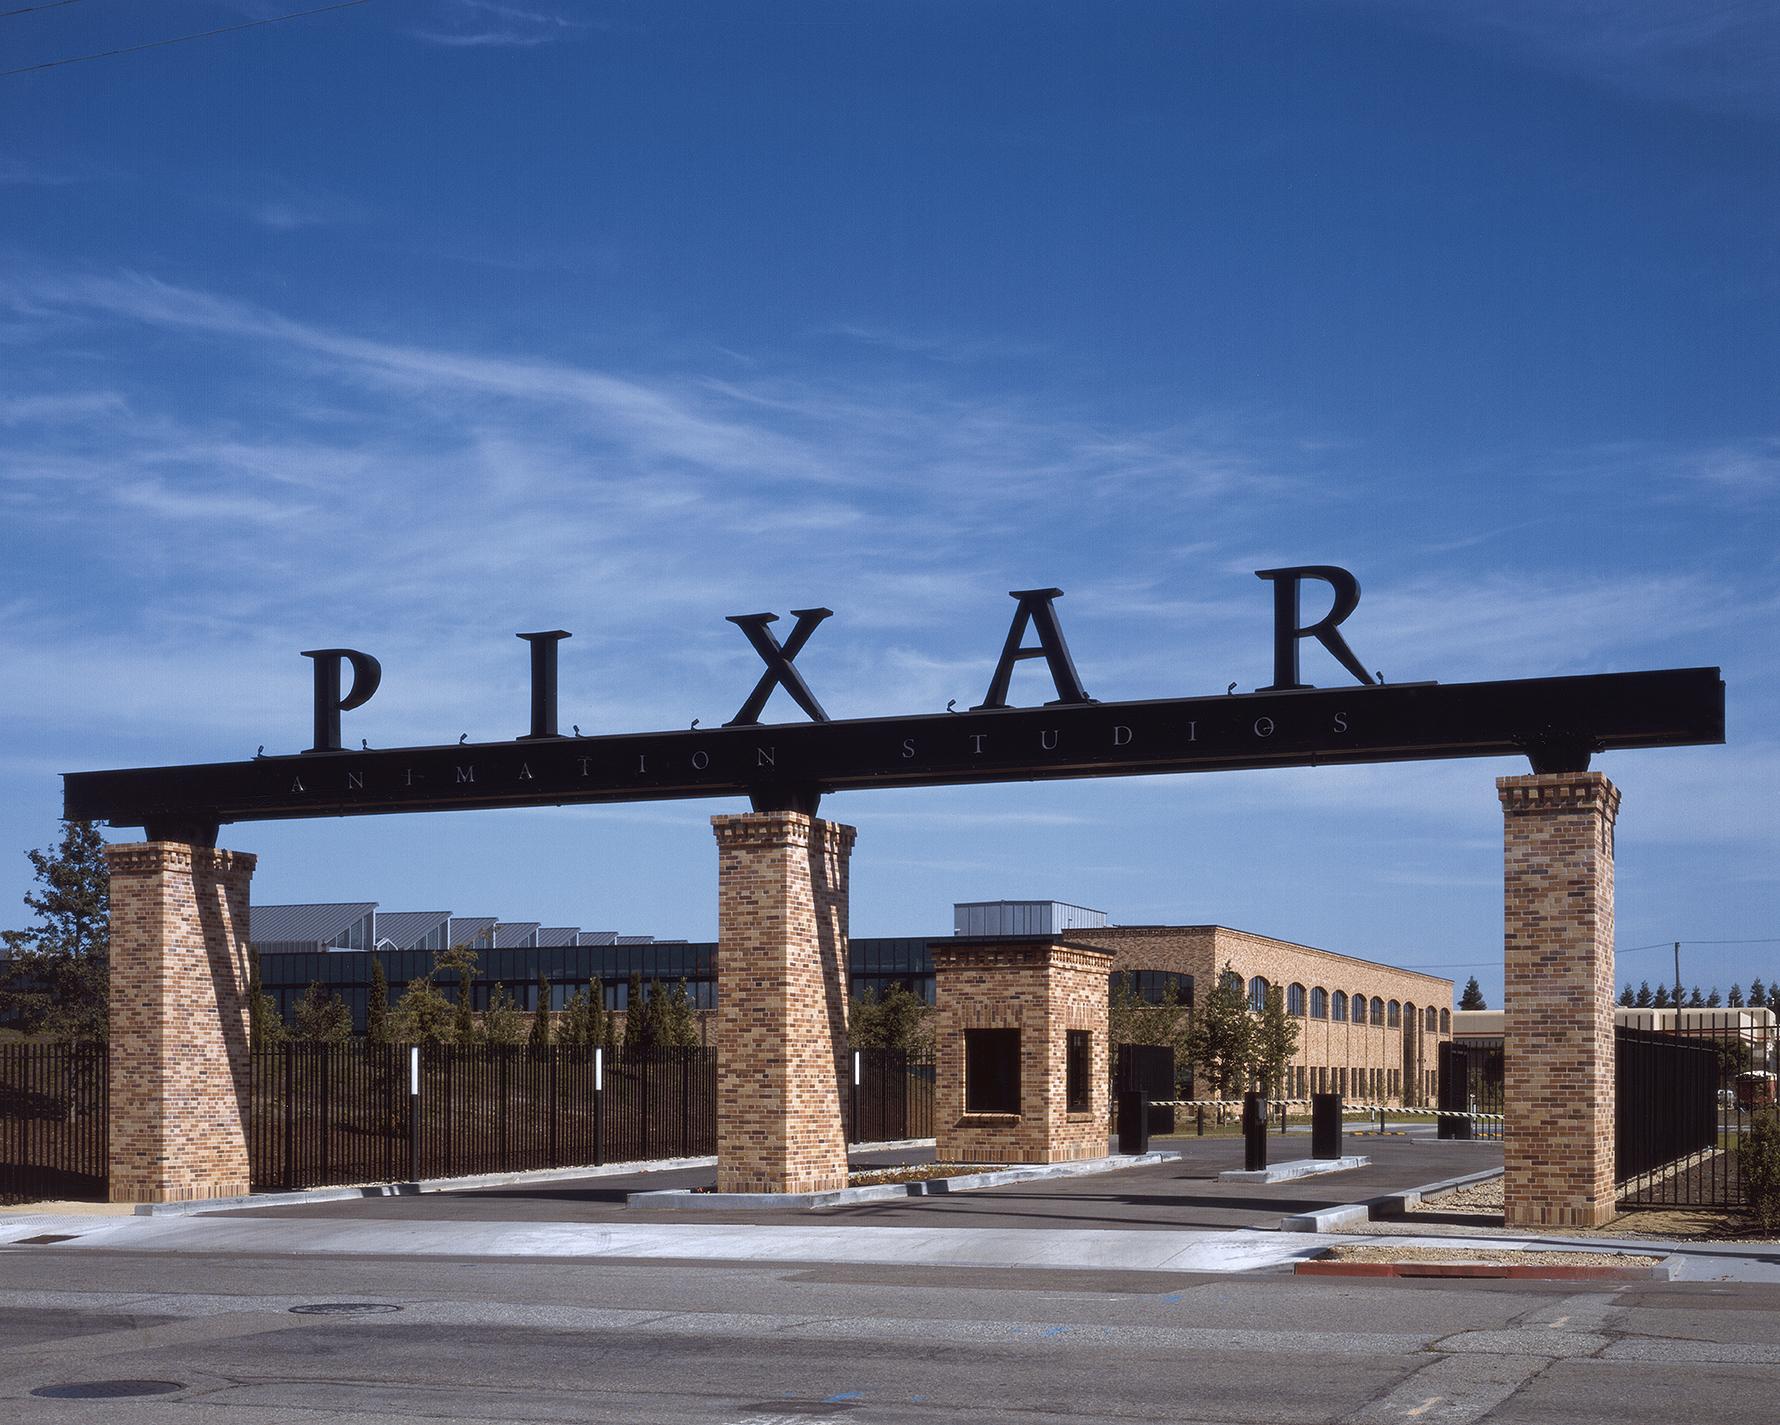 01-Pixar-SR-ext1.jpg